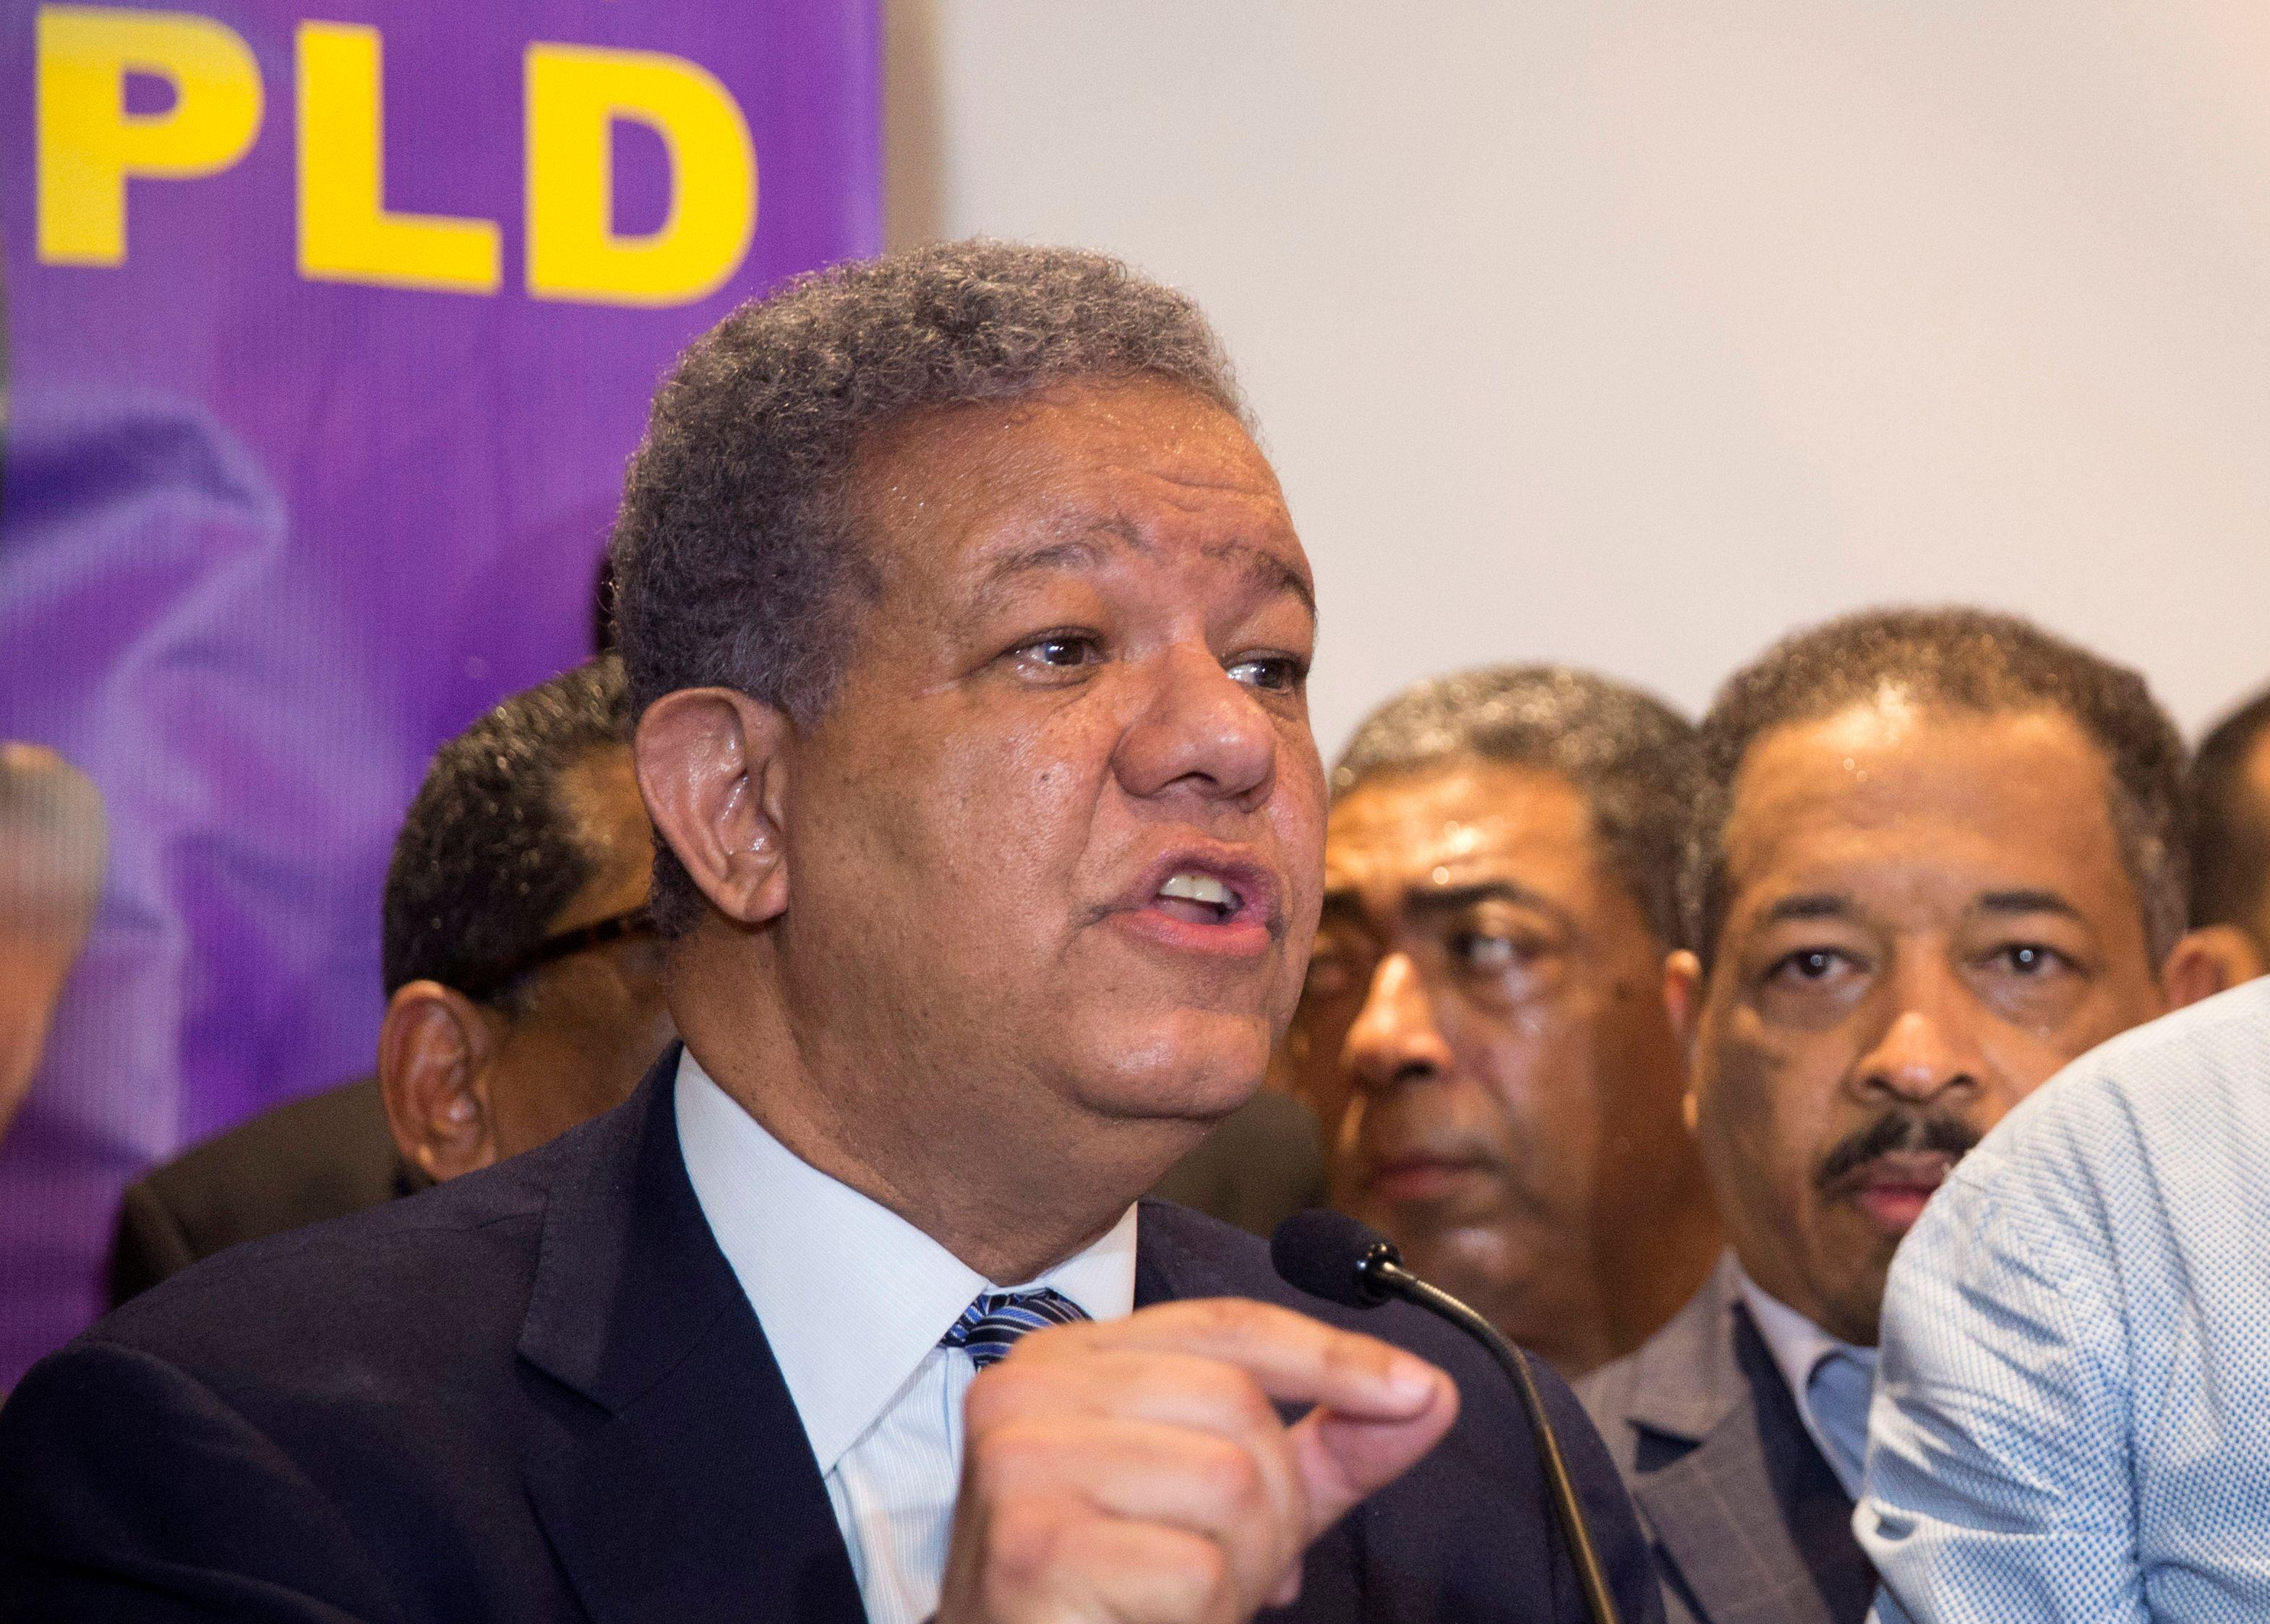 Leonel Fernandez speaking at a news conference